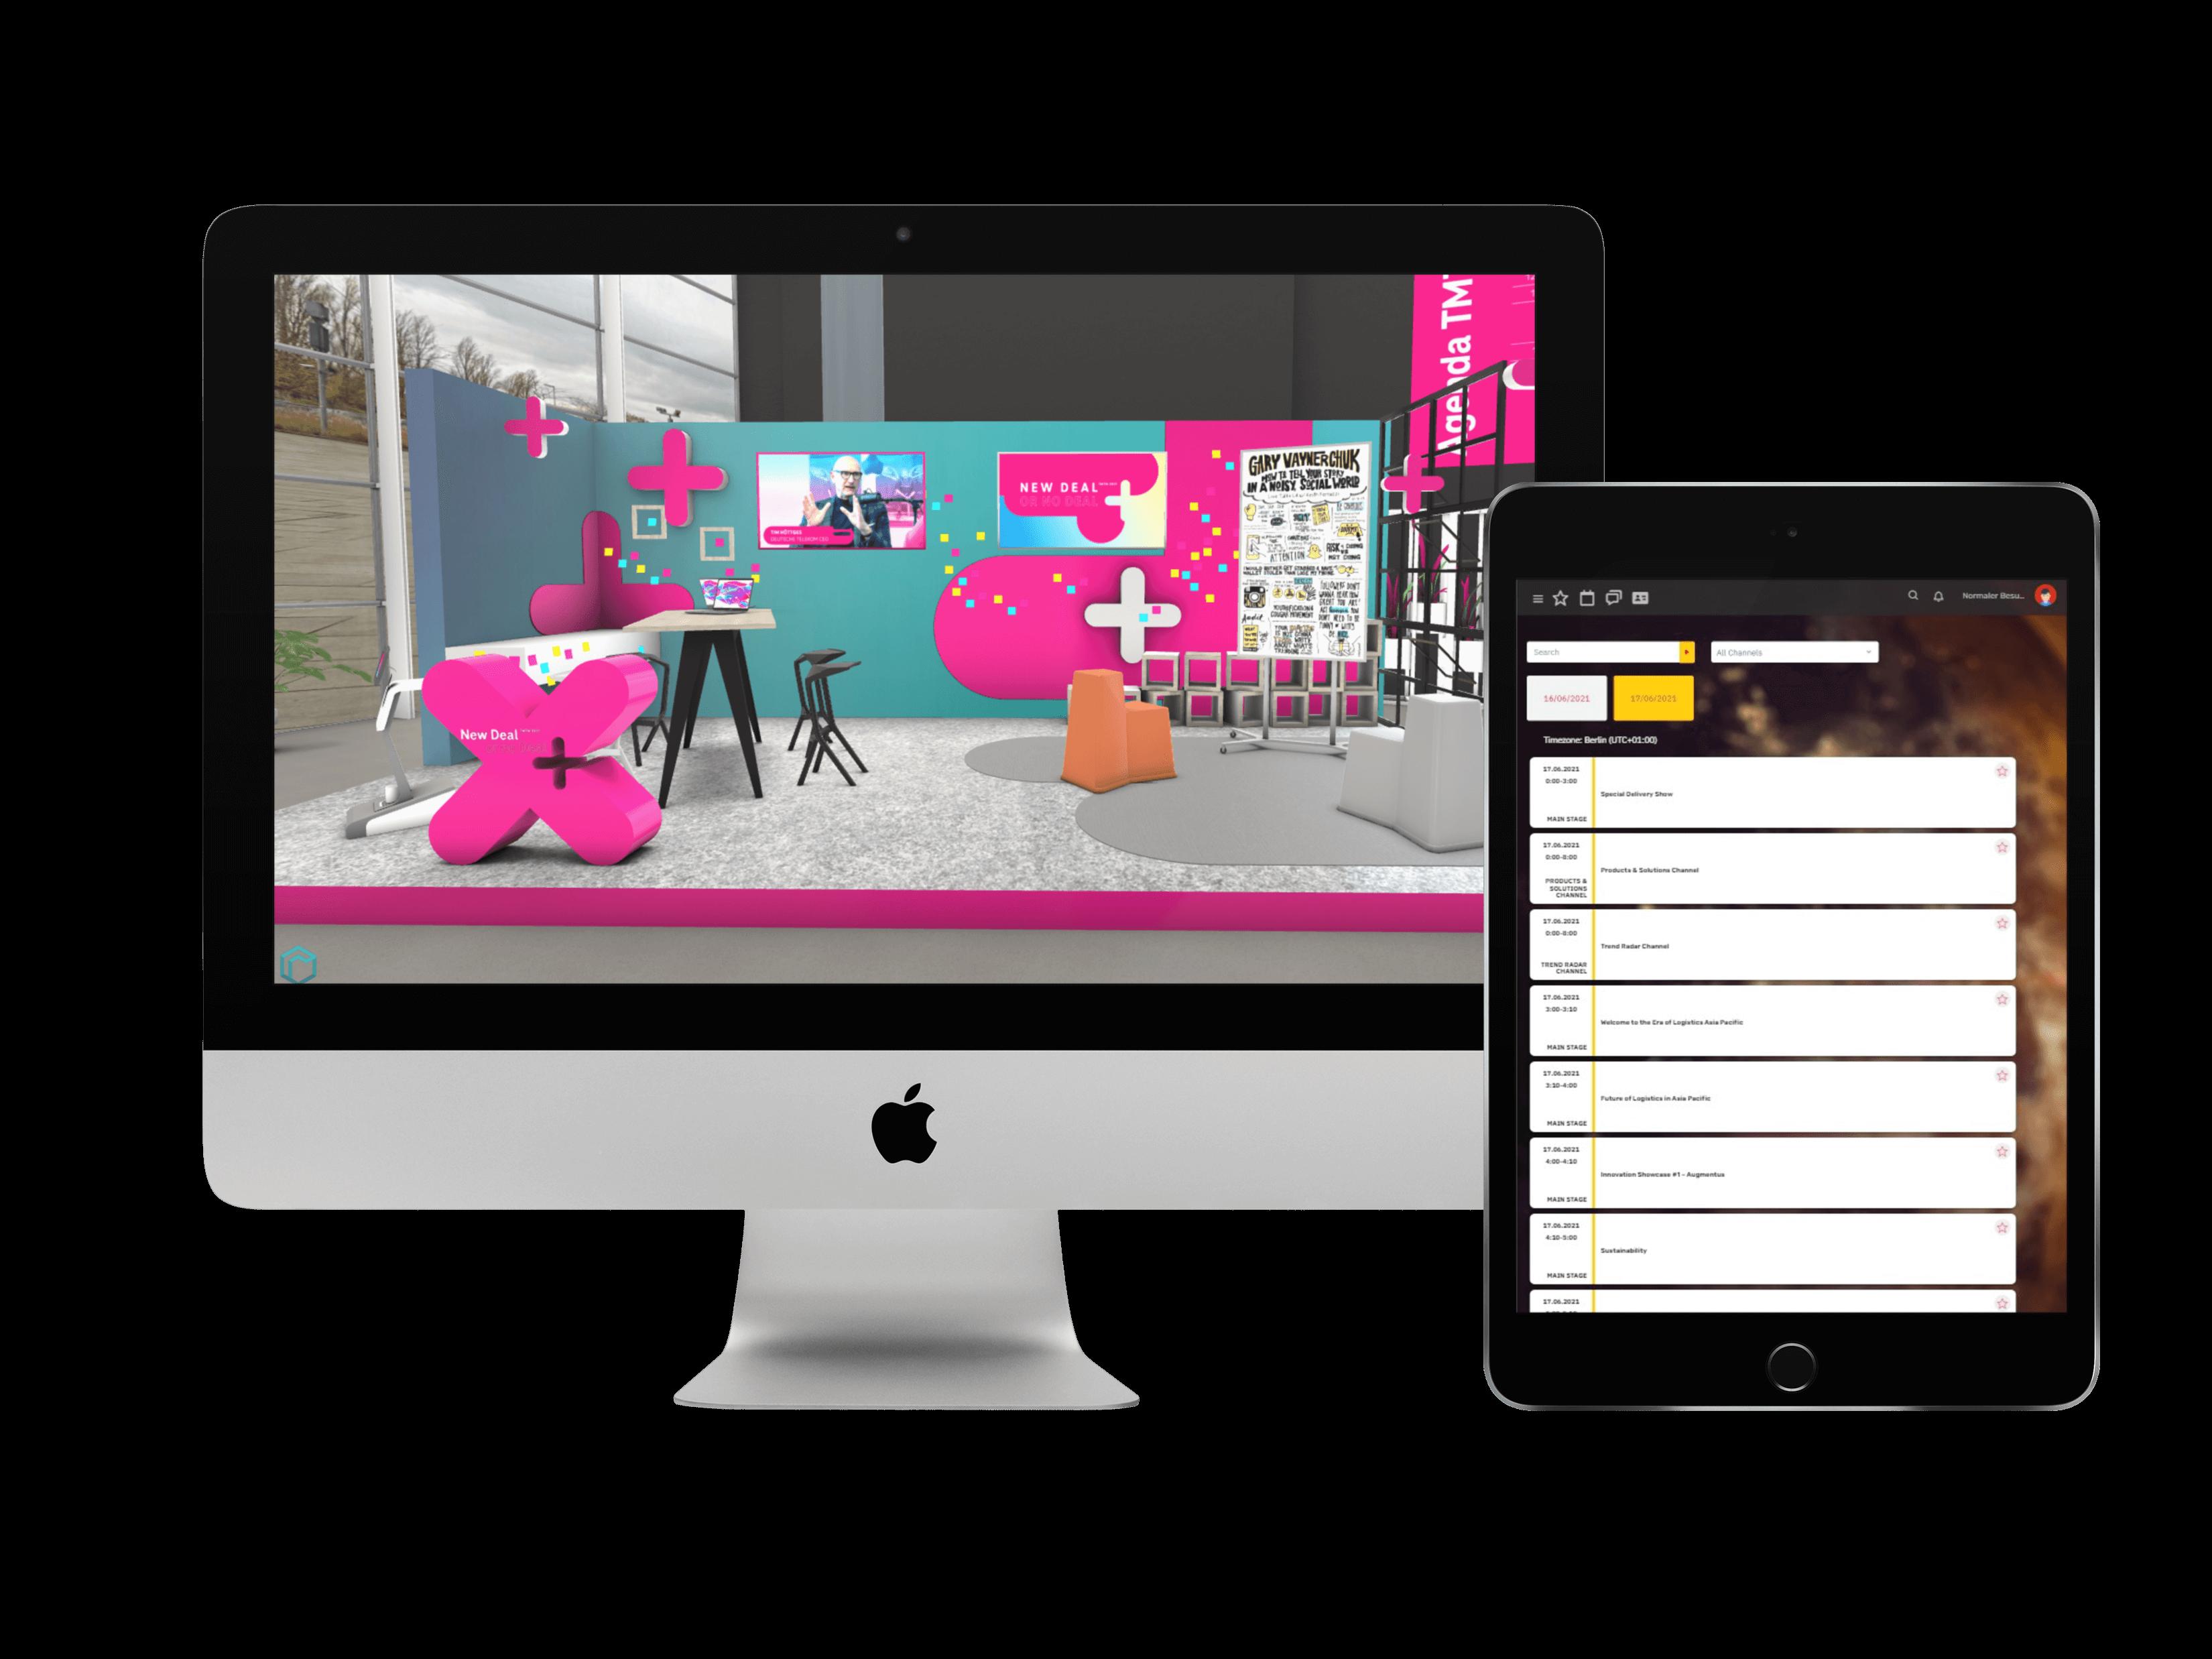 EventCloud platform virtual conference desktop & tablet